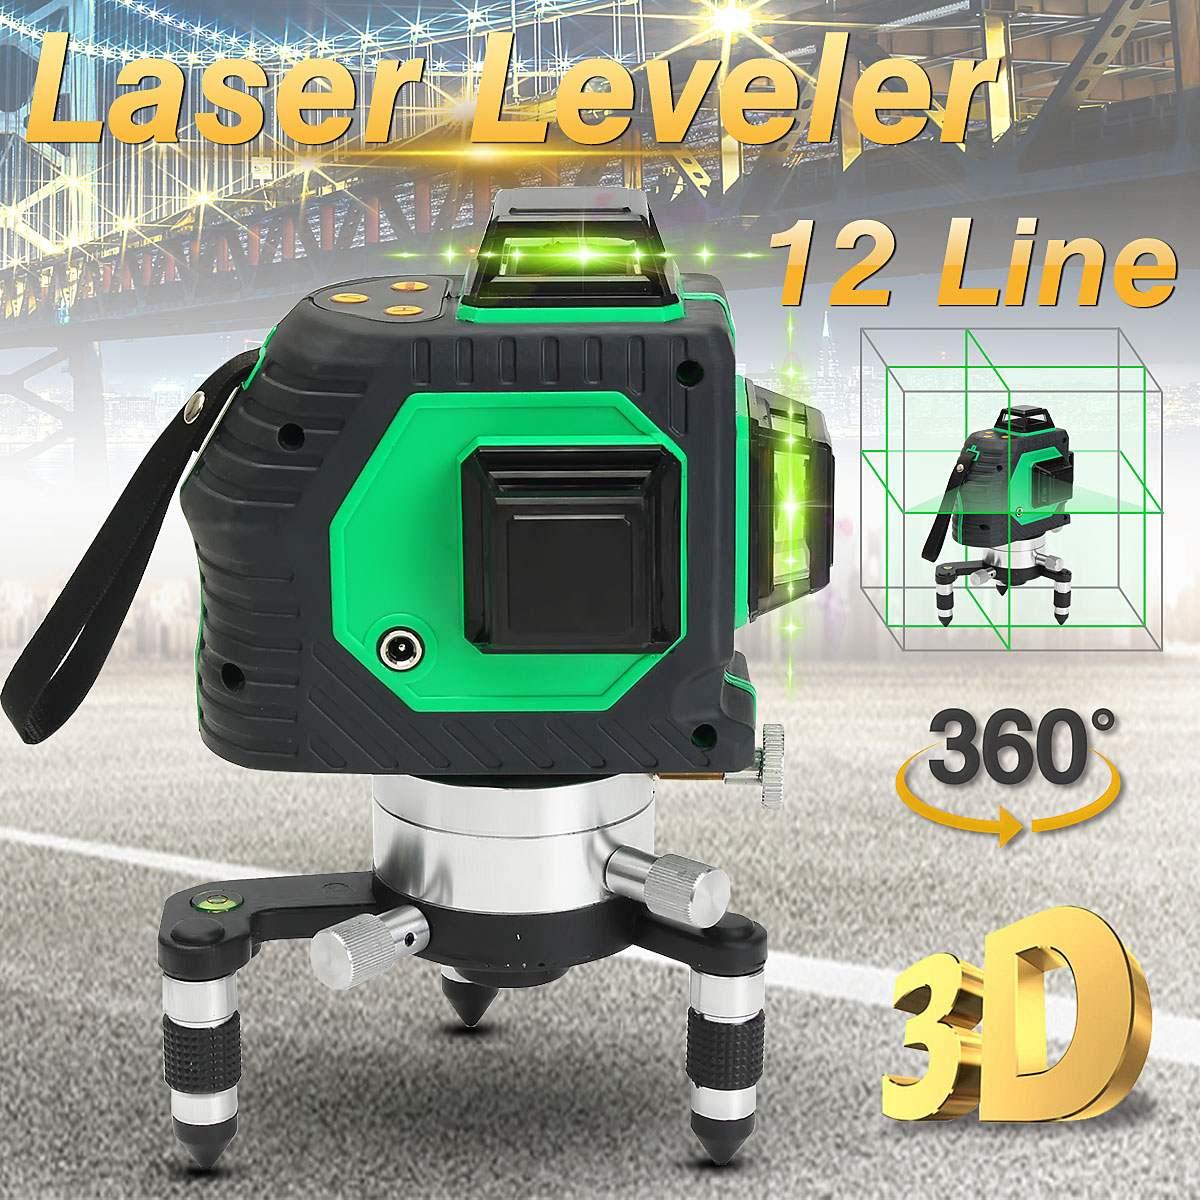 3D 12 Lines Laser Leveler Automatic 360 Degree Laser Self Leveling Cross Vertical Horizontal Level Cross Measuring Tool leter 3d red laser level self leveling 12 lines 360 degree horizontal